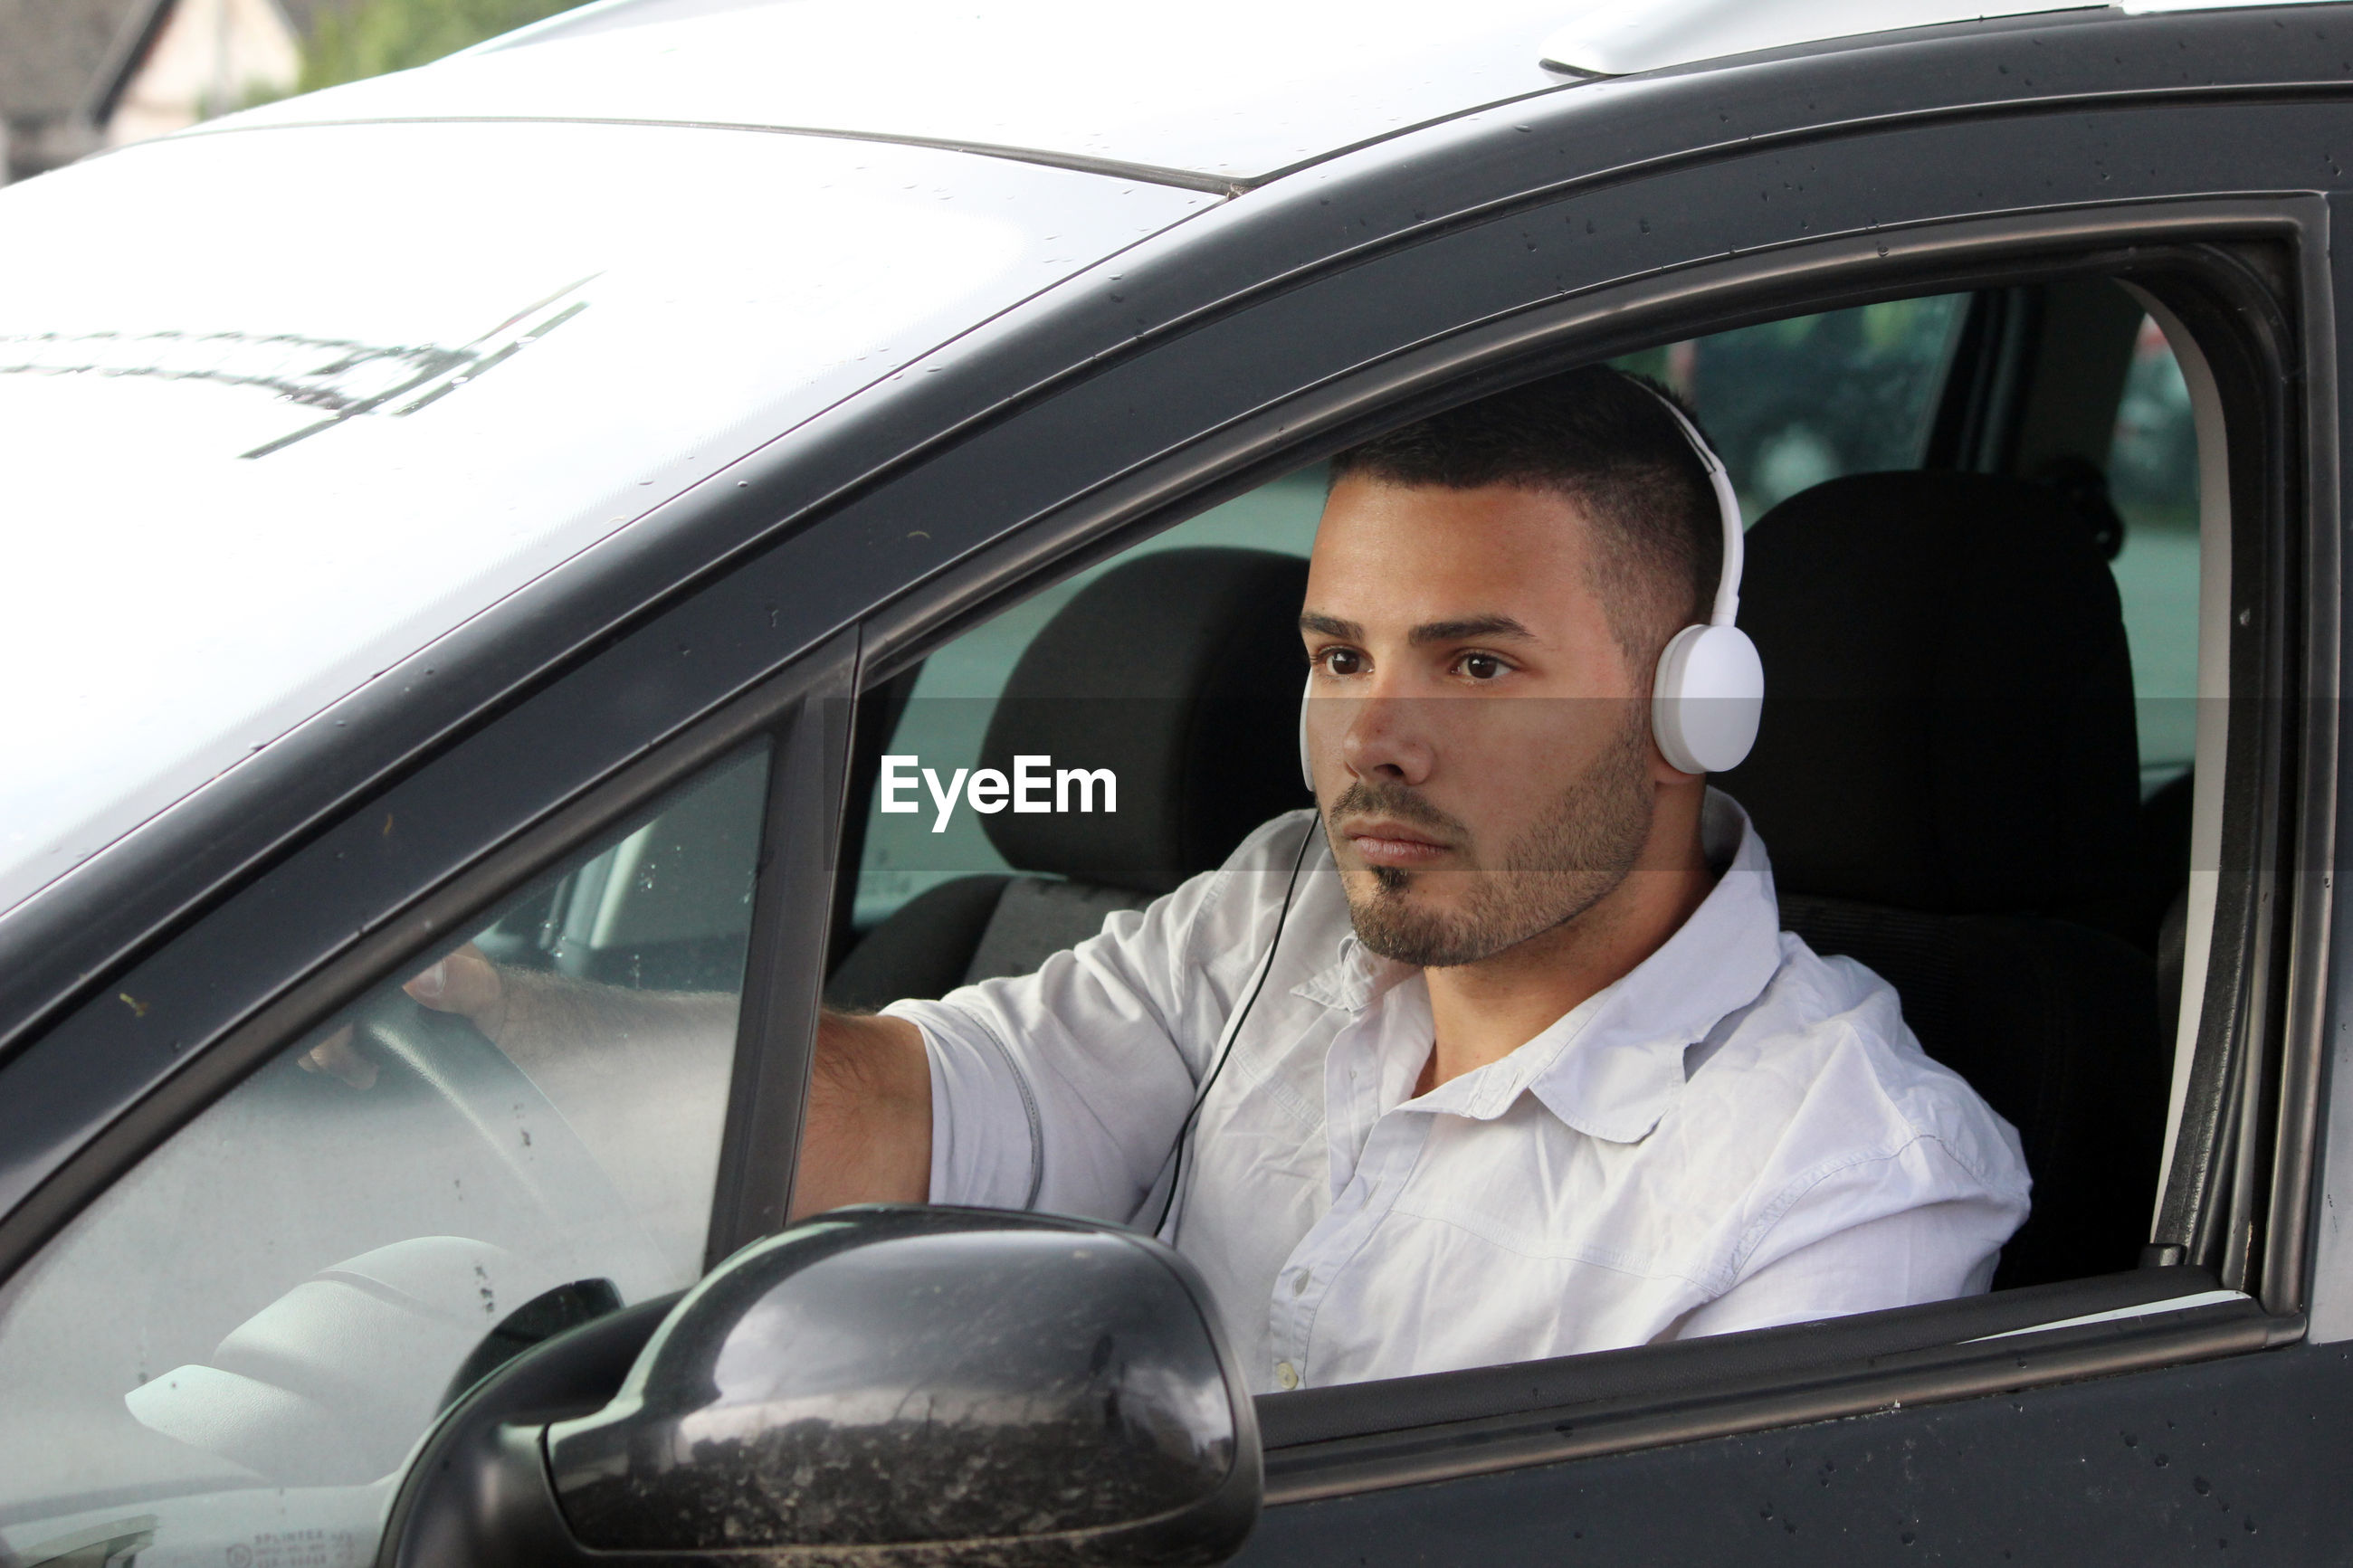 Man wearing headphones driving car seen through window